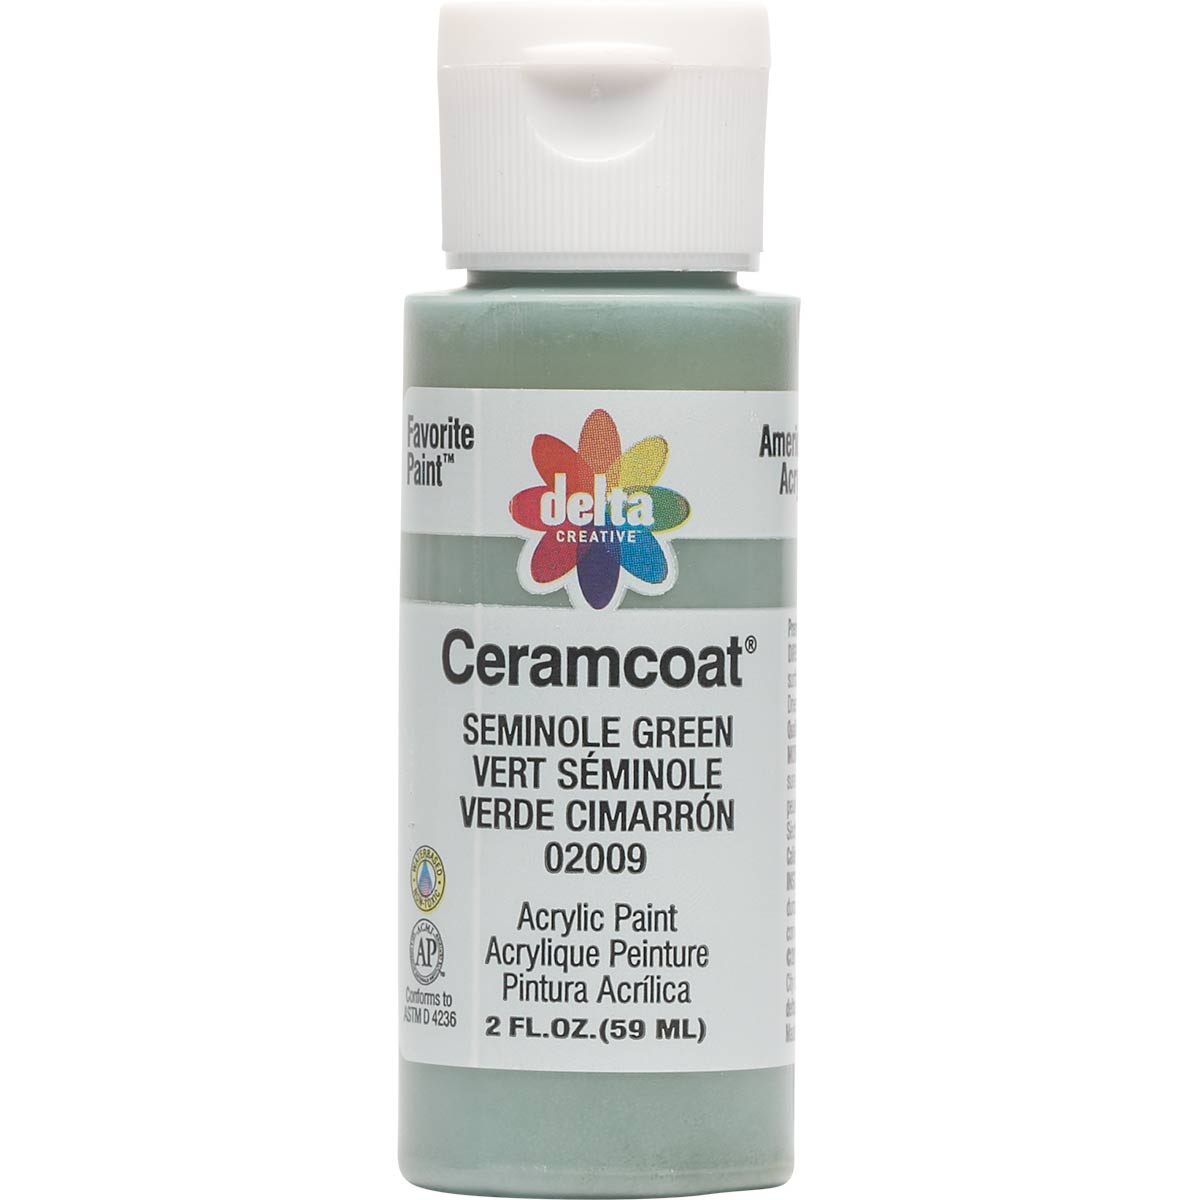 Delta Ceramcoat ® Acrylic Paint - Seminole Green, 2 oz. - 020090202W